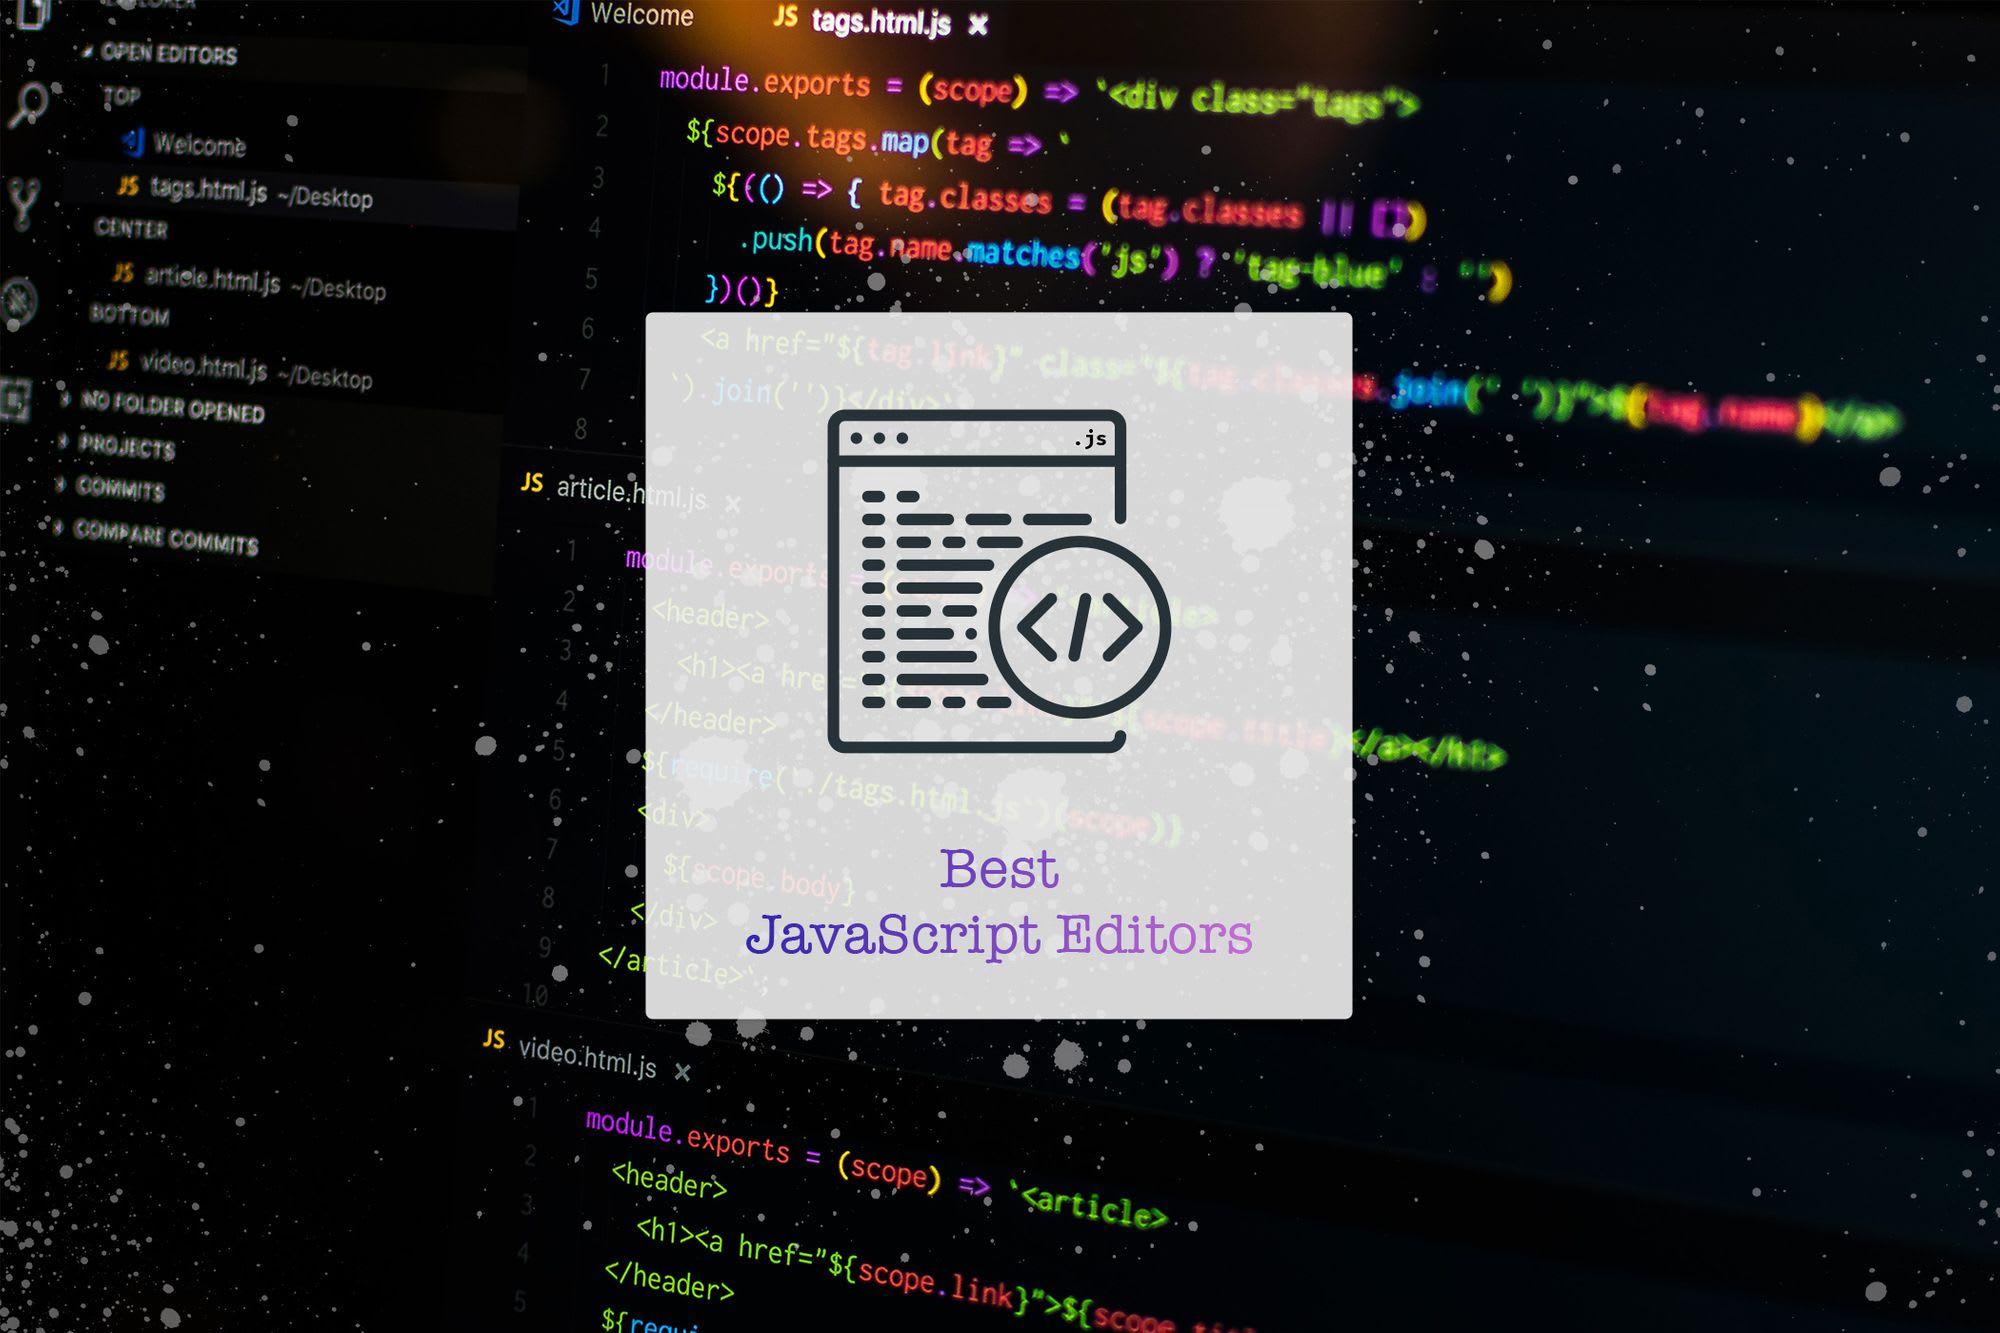 5 Best JavaScript Editors: Best Tools Ranked by Developers Worldwide